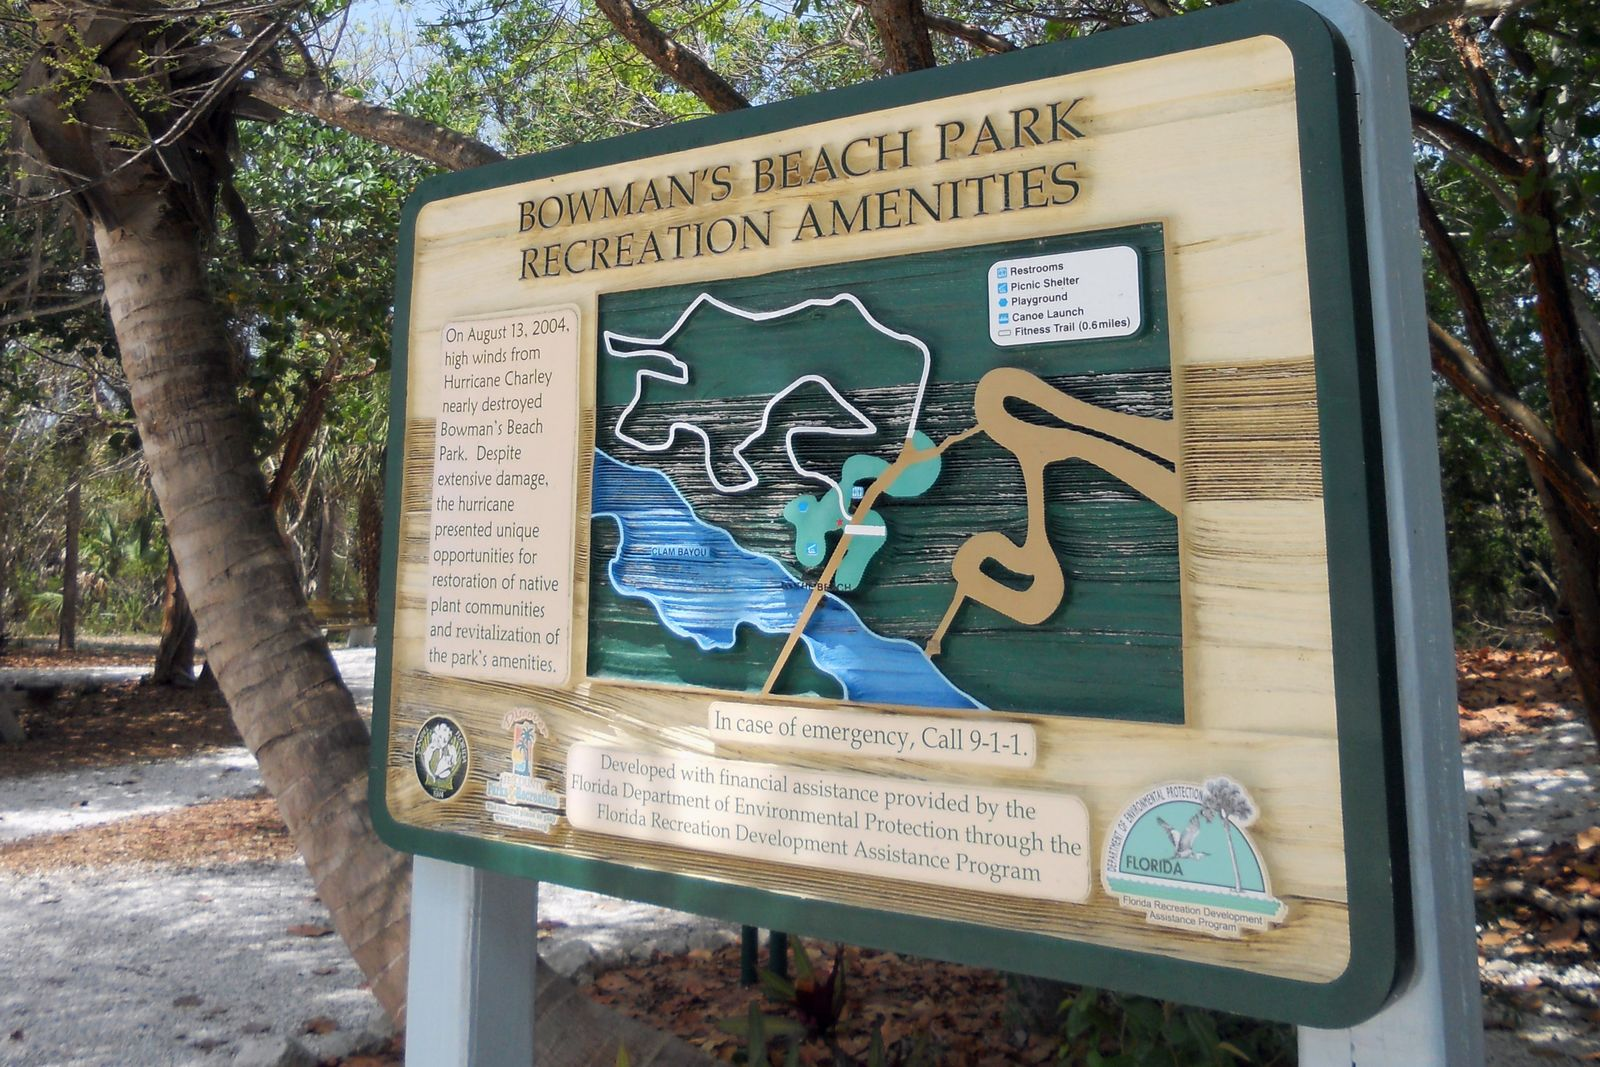 Übersichtskarte Bowman's Beach Park